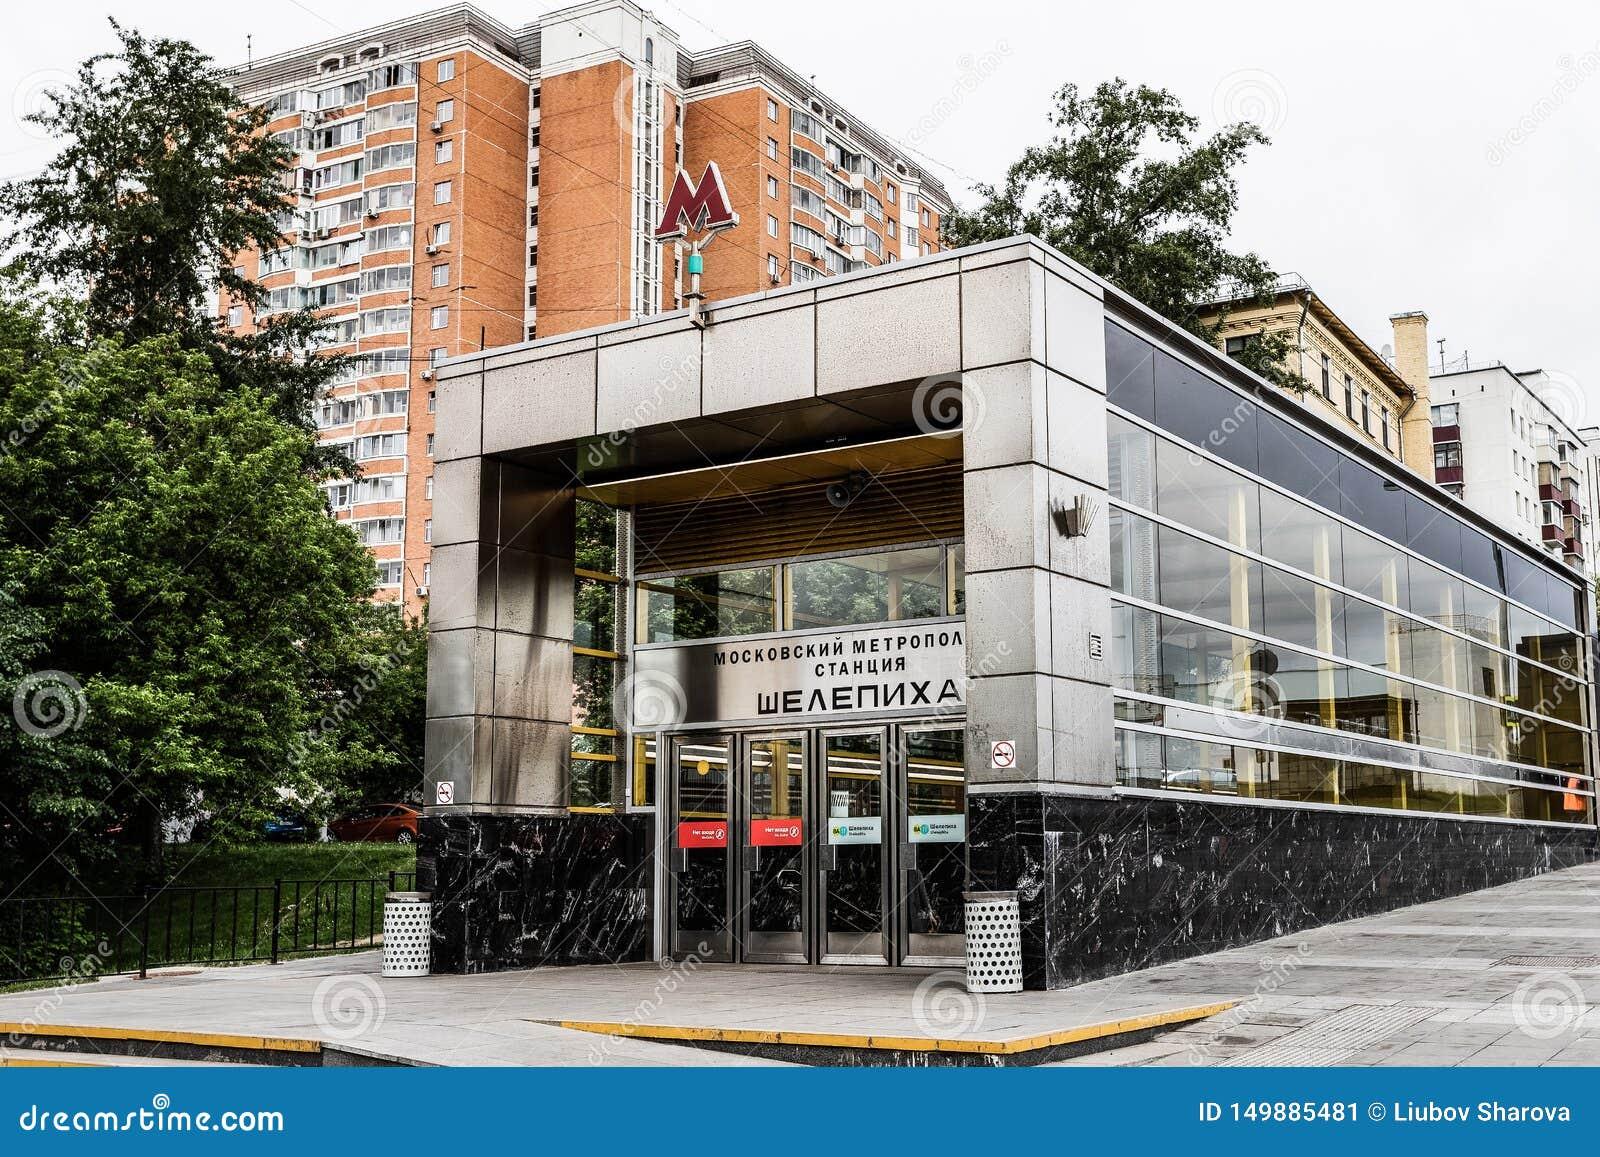 Moscow, Russia may 26, 2019, new modern metro station Shelepiha. Built in 2018 Solntsevskaya metro line